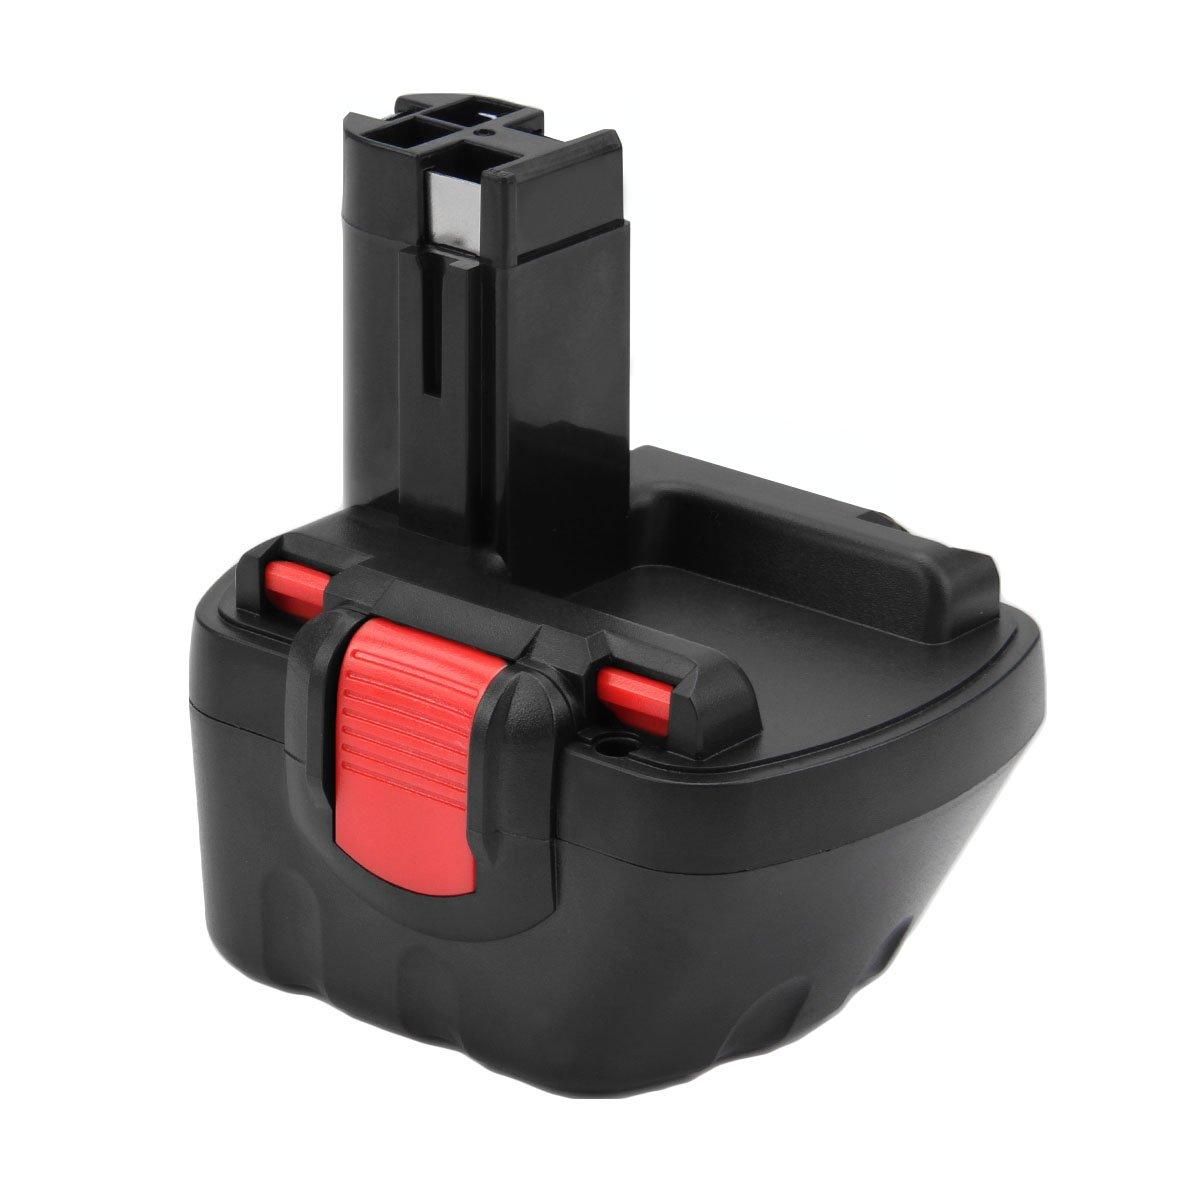 Creabest New 12V 3.5Ah Ni-MH Replacement Battery Compatible with Bosch BAT120 BAT139 BAT159 BAT043 BAT045 2607335275 2607335533 2607335557 13614 13614-2G 15614 1661 22614 32614 34614 366